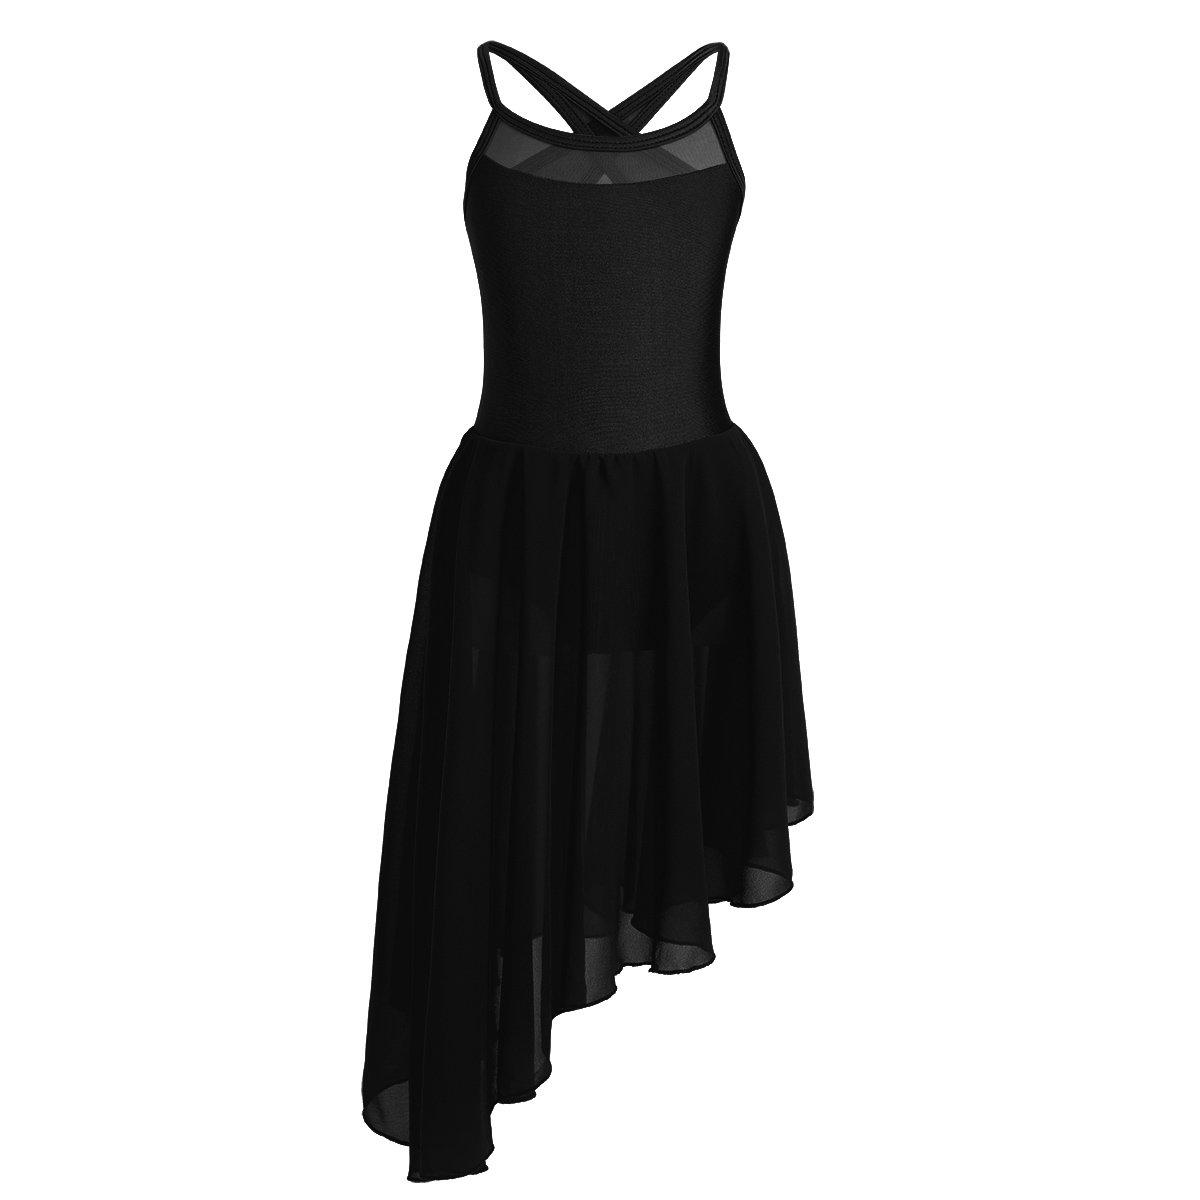 YiZYiF DRESS ガールズ DRESS ブラック B07DQJ3WXX YiZYiF ブラック 43781, ワダマチ:2128034f --- ijpba.info